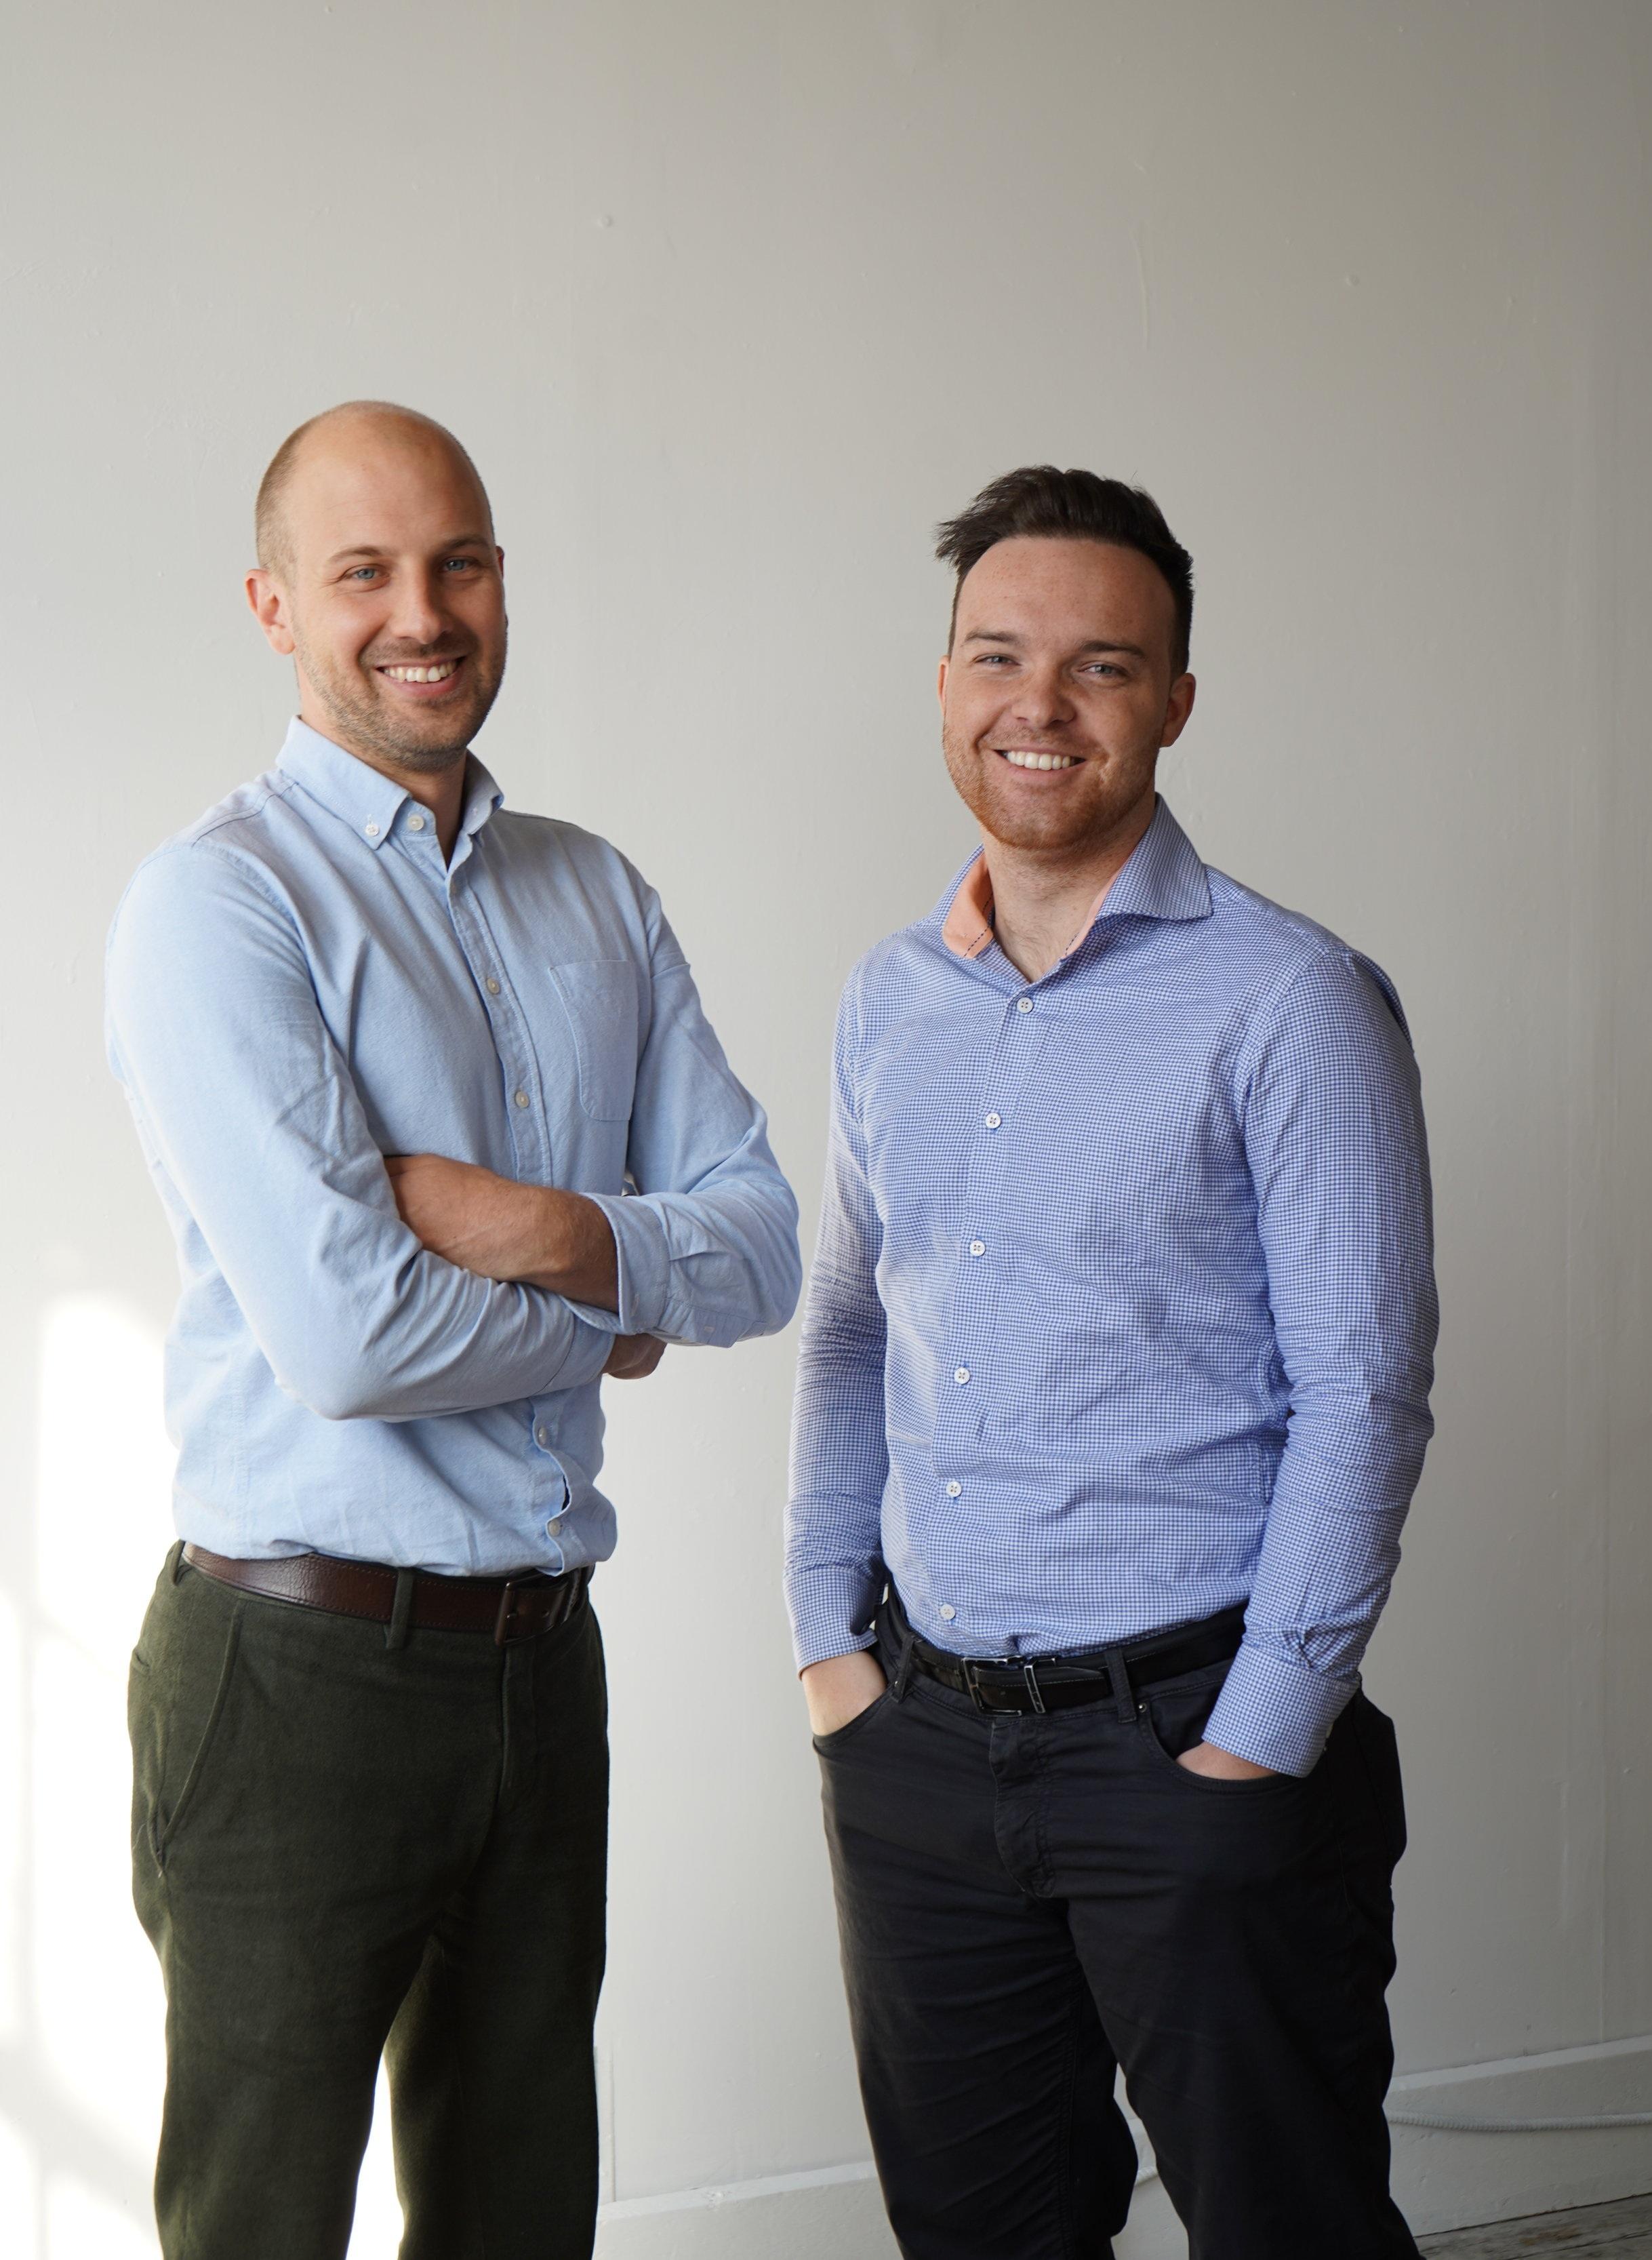 Eddie Obeliunas and Matthew Jaglowitz, founders of Exactus Energy.